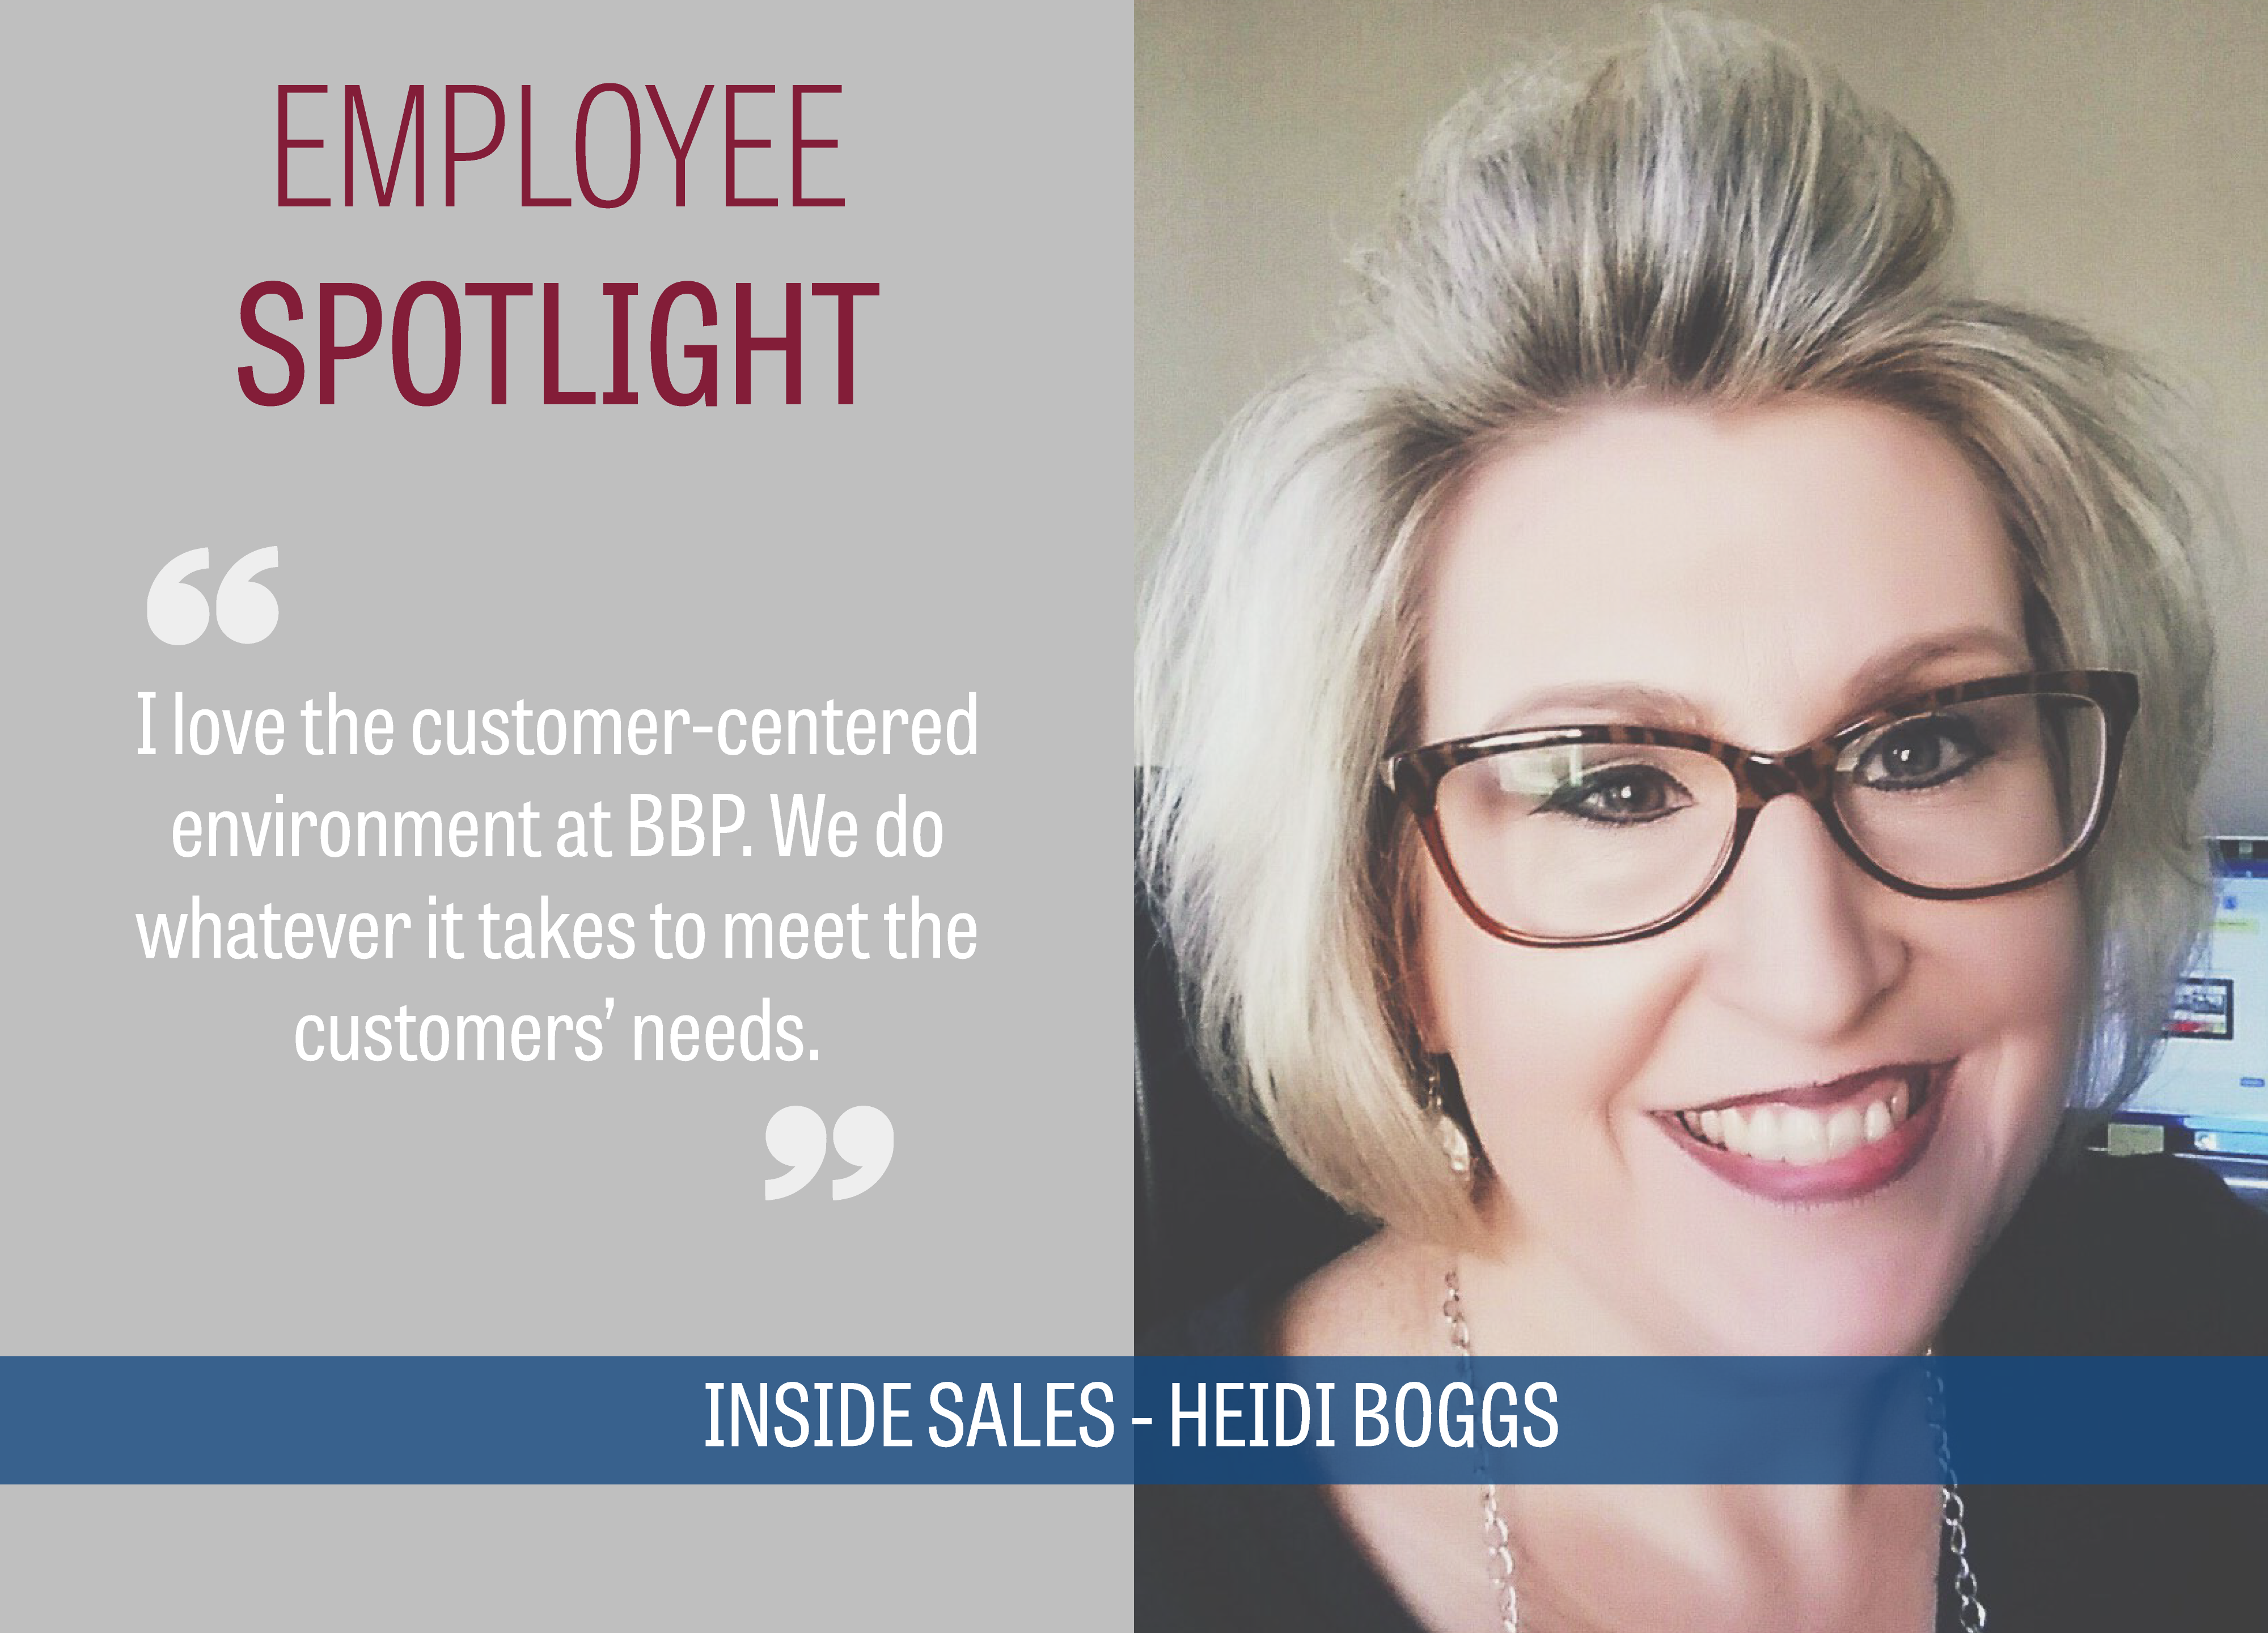 BBP Employee Spotlight Heidi Boggs